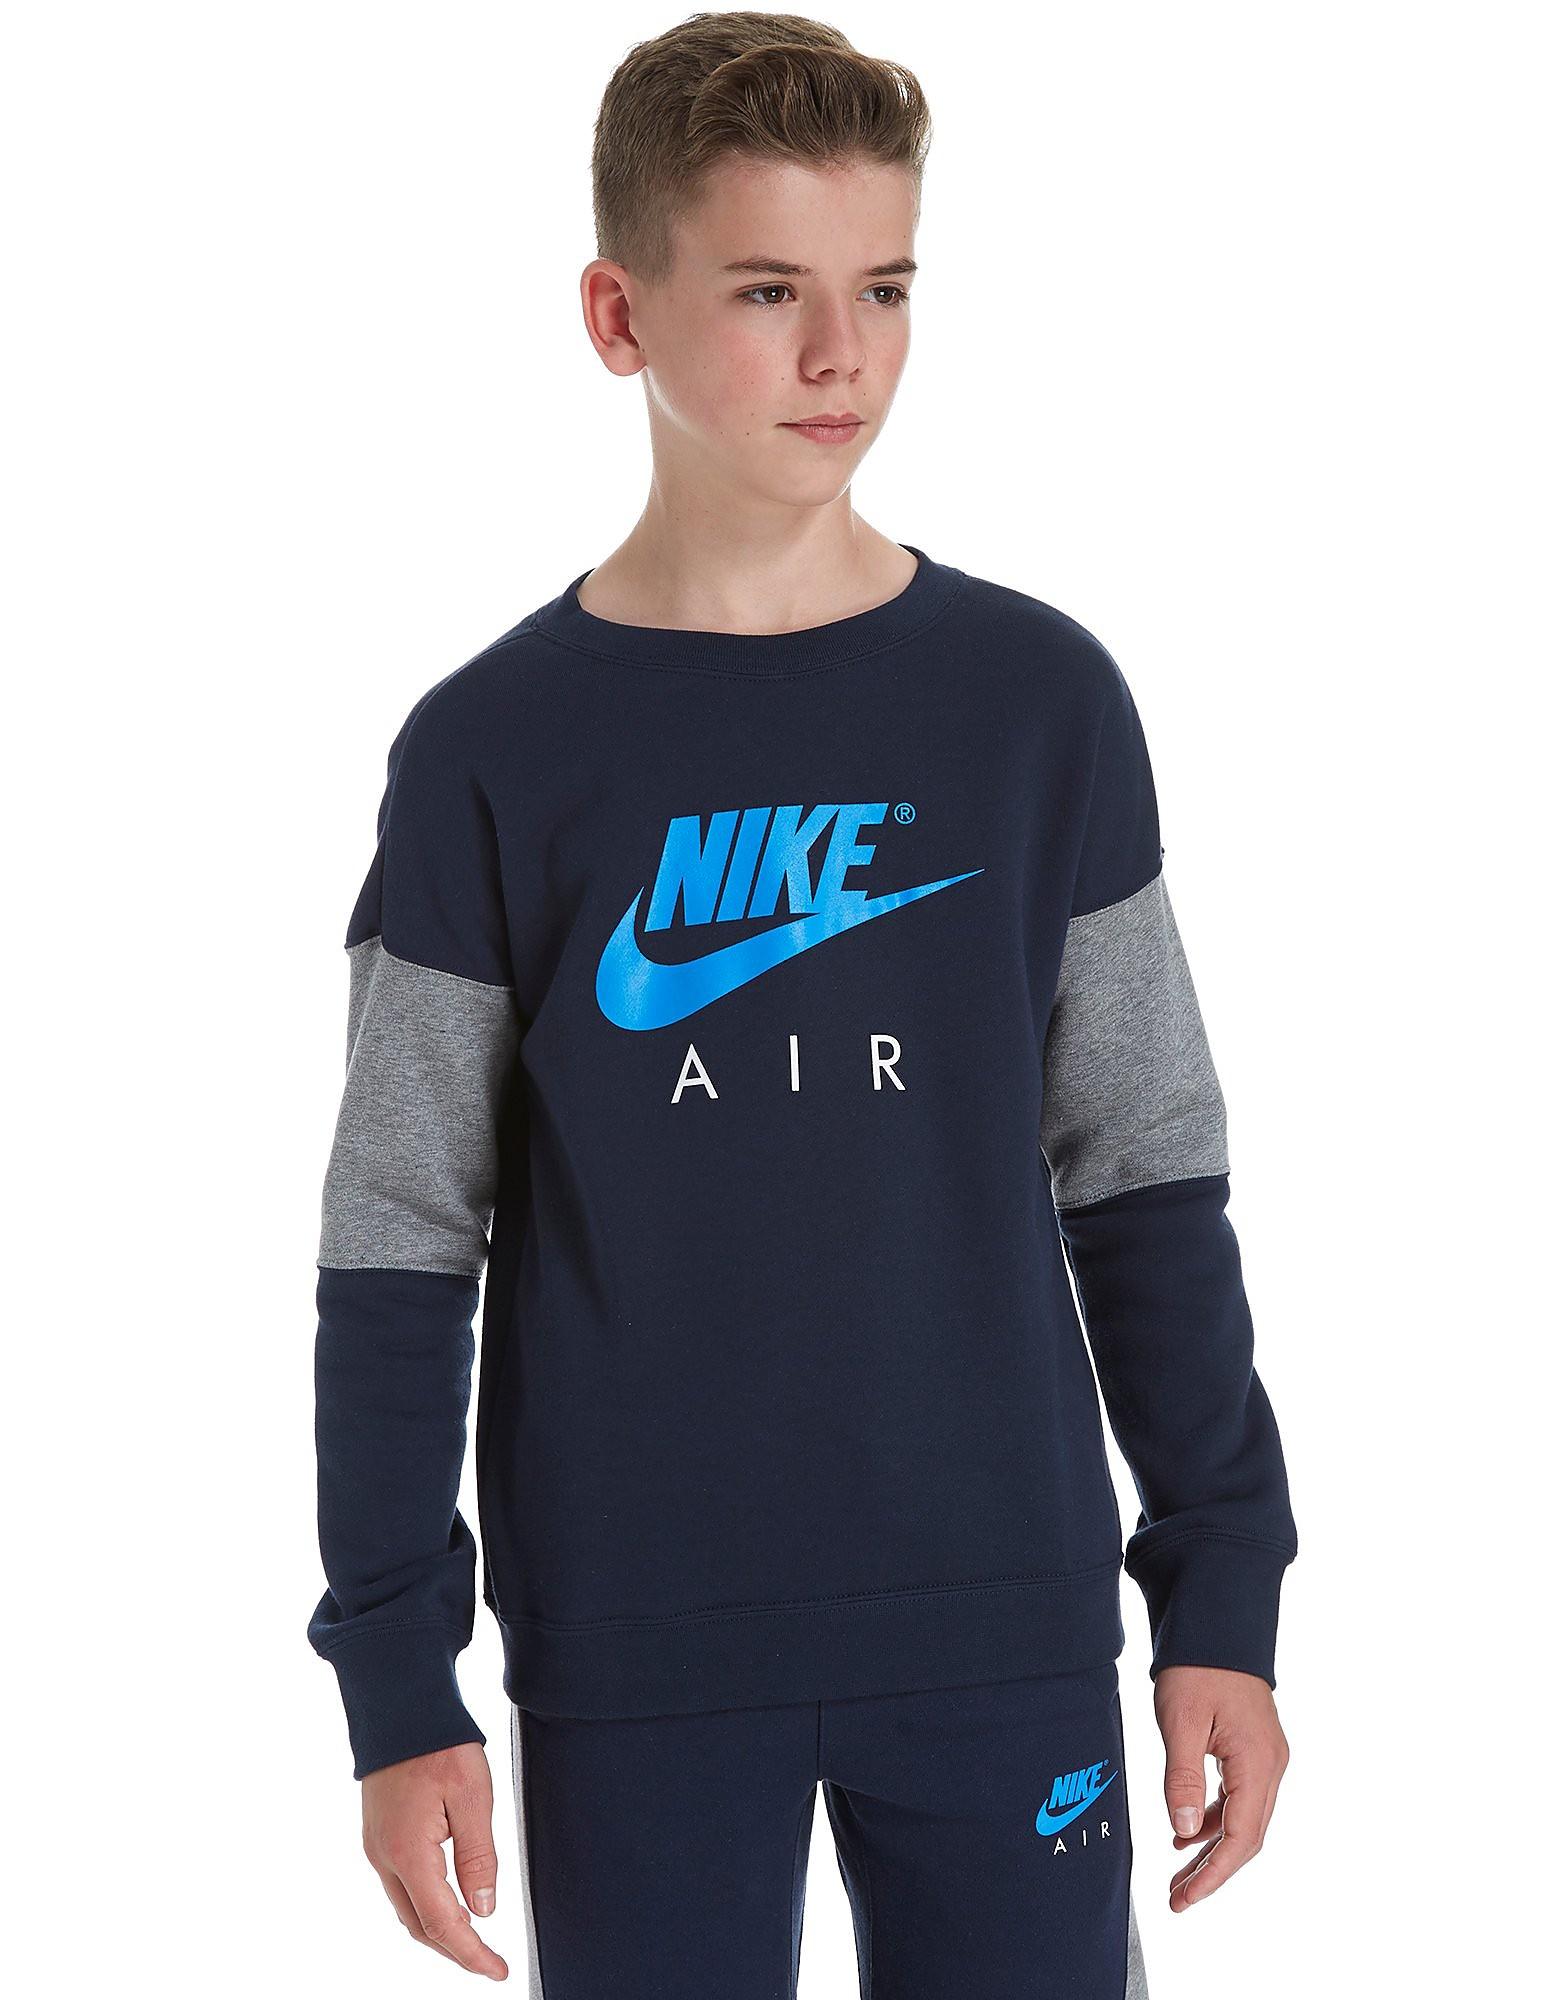 Nike Sweatshirt Air crew Junior